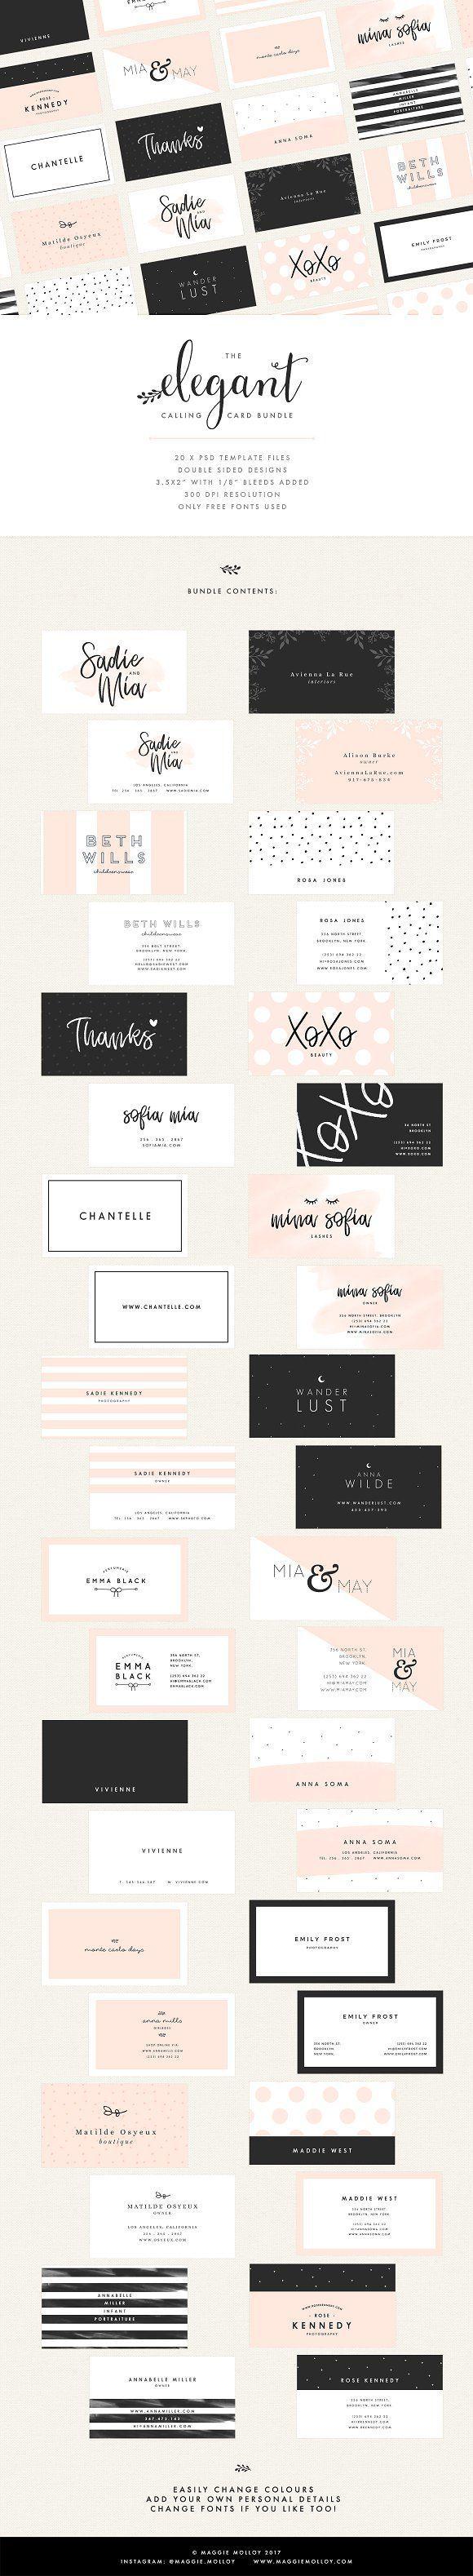 20 Feminine Business Card Templates | Pinterest | Card templates ...